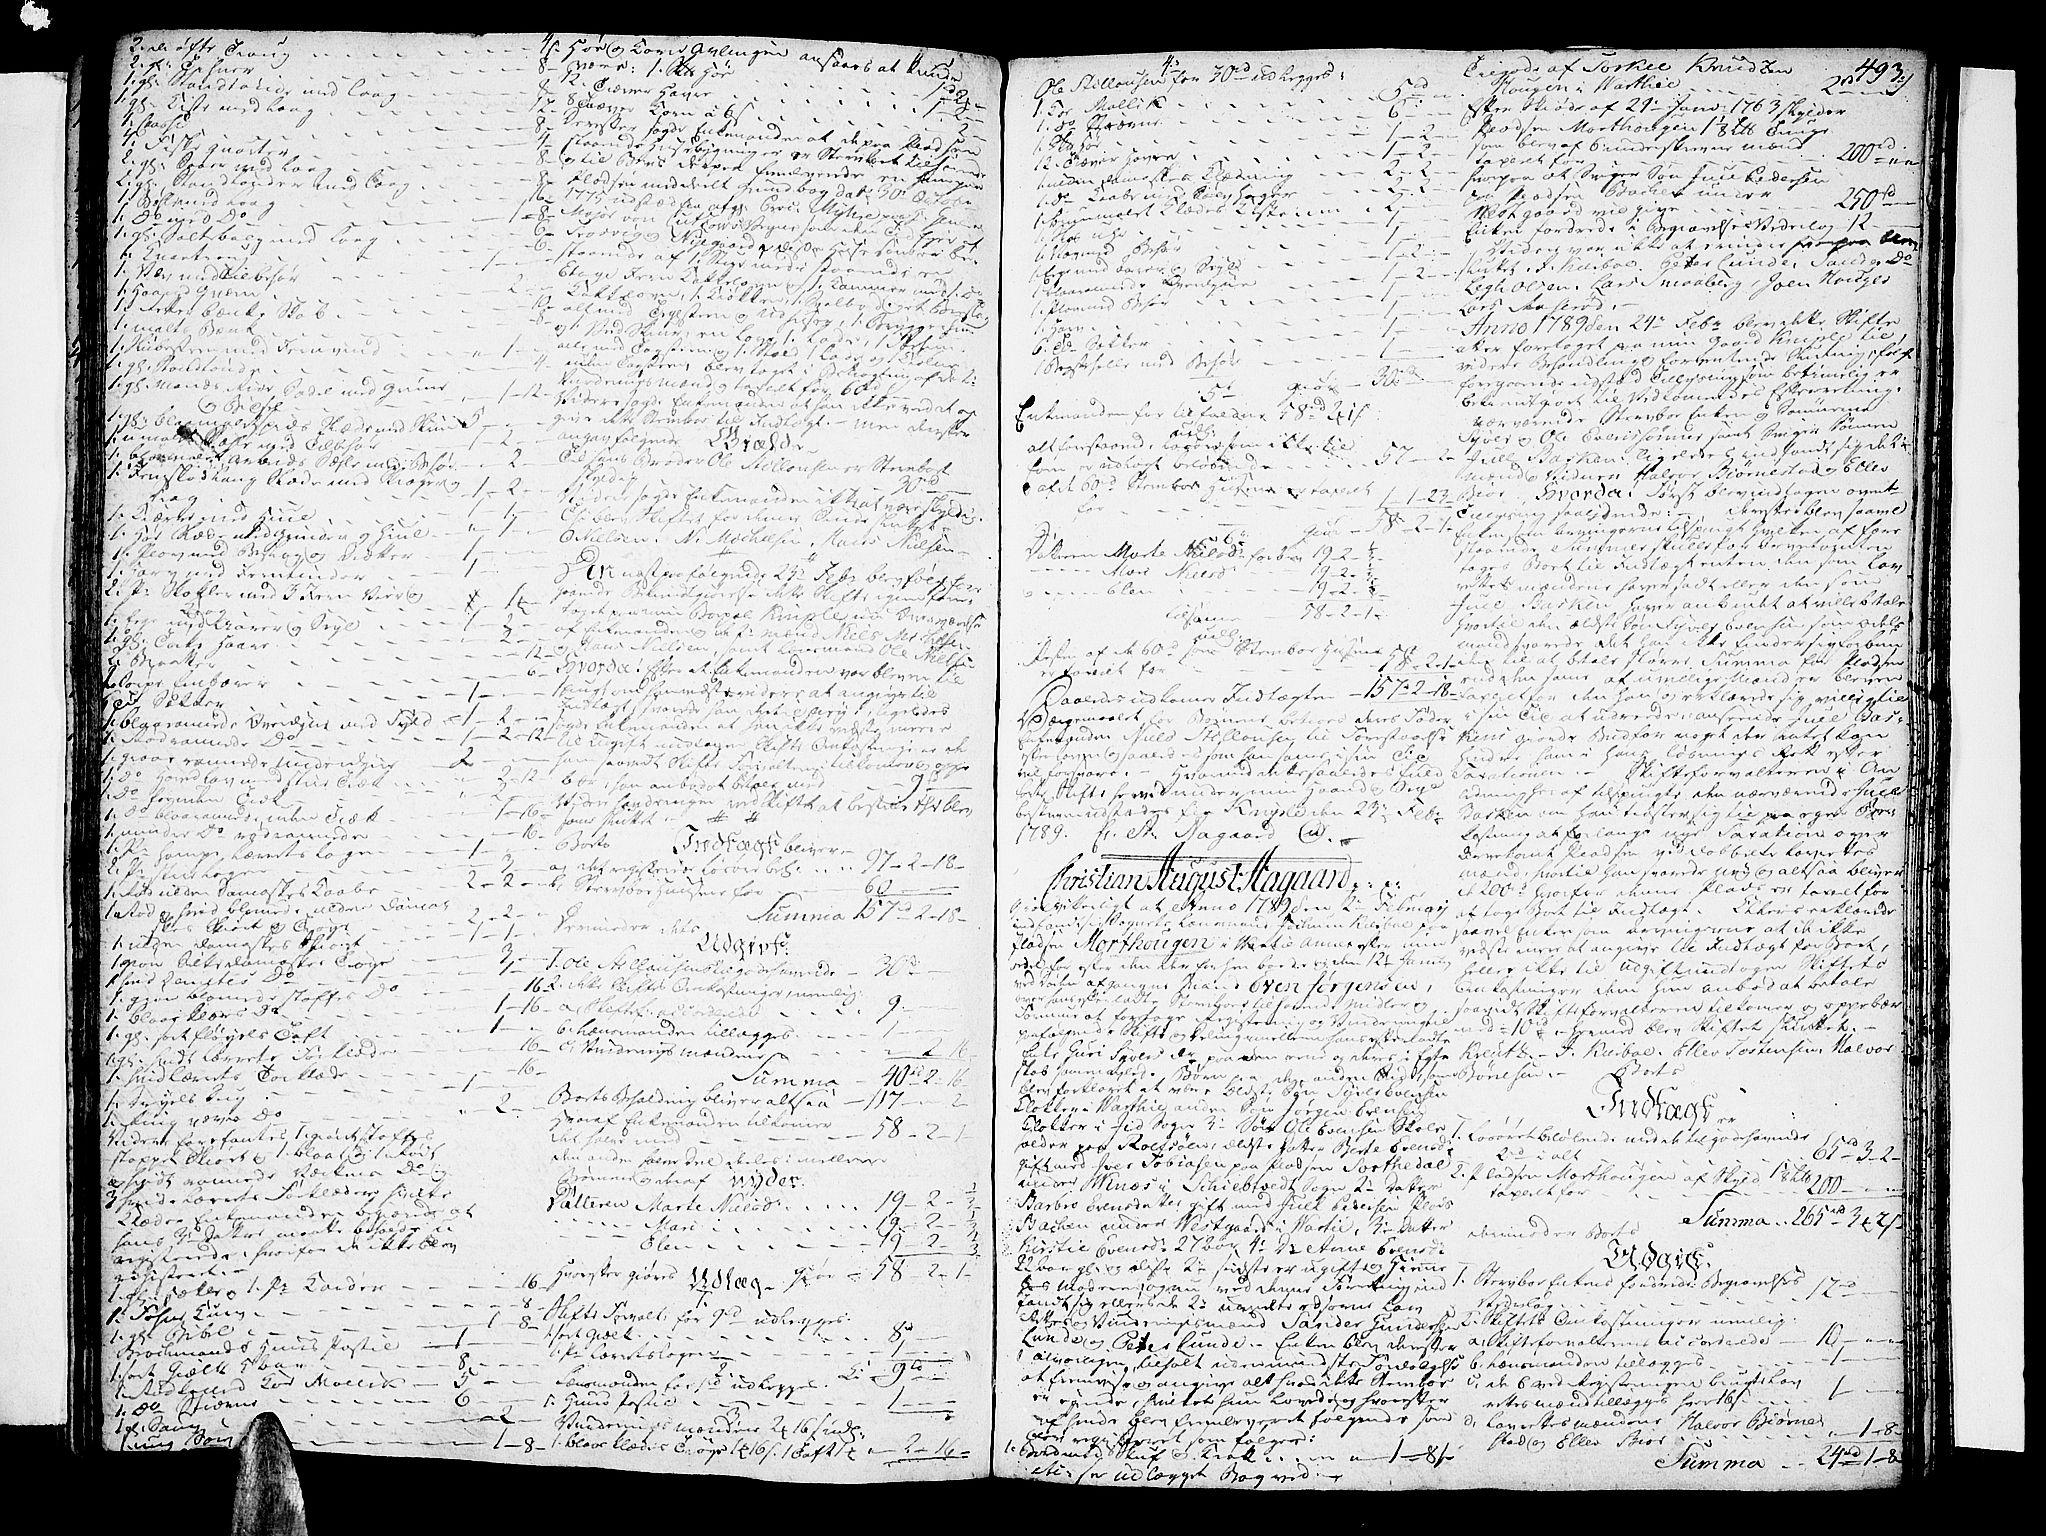 SAO, Tune sorenskriveri, H/Hb/L0002: Skifteprotokoll, 1781-1789, s. 492b-493a